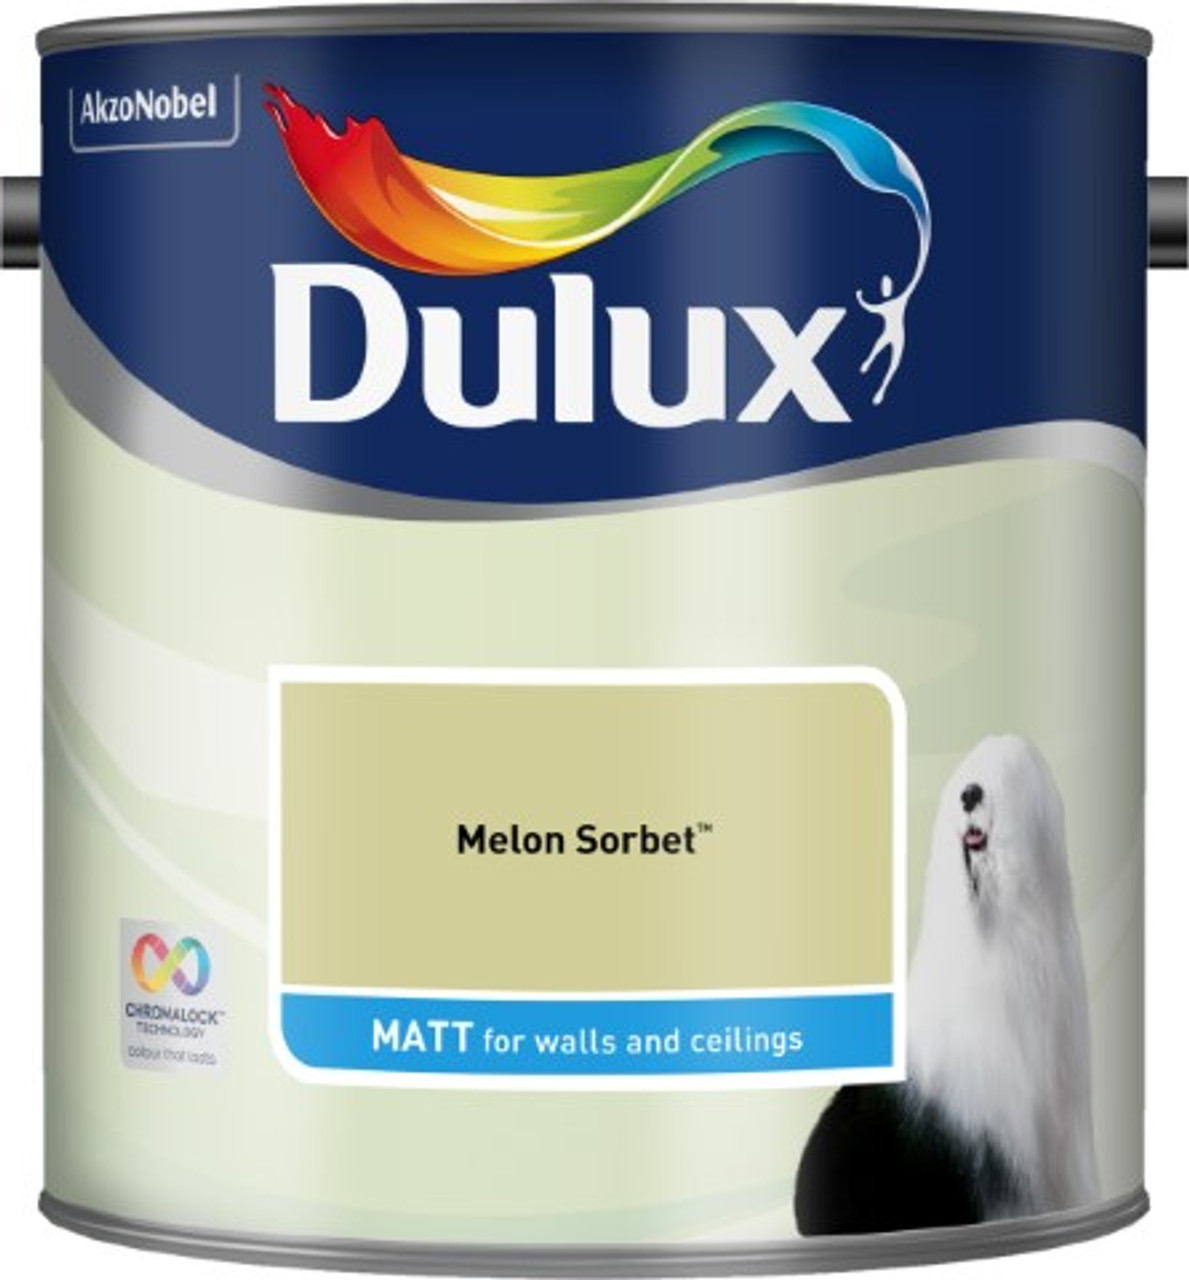 2.5L Dulux Matt Emulsion Melon Sorbet